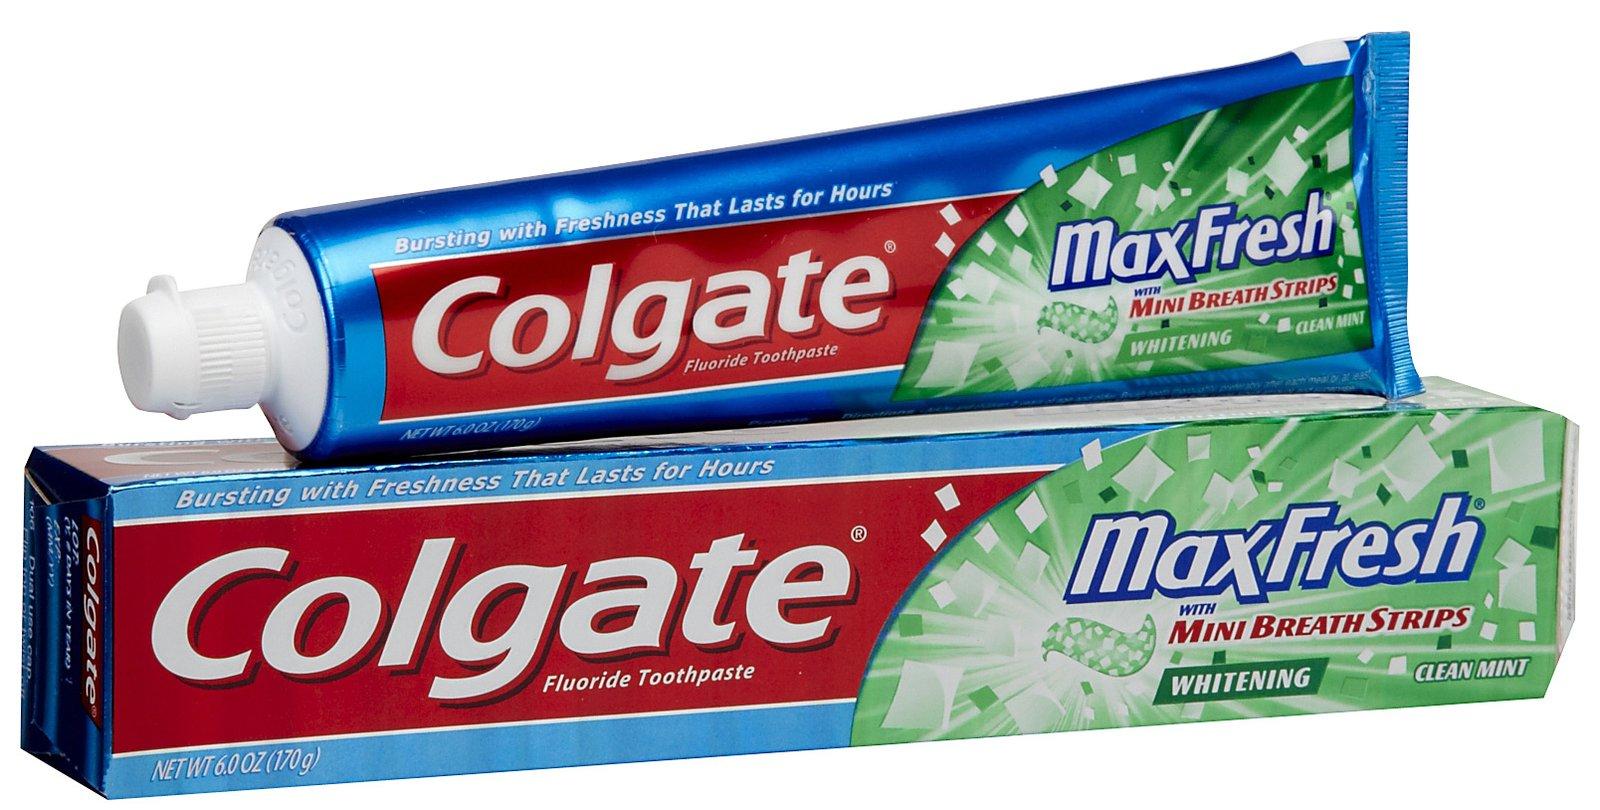 colgate-maxfresh.jpg